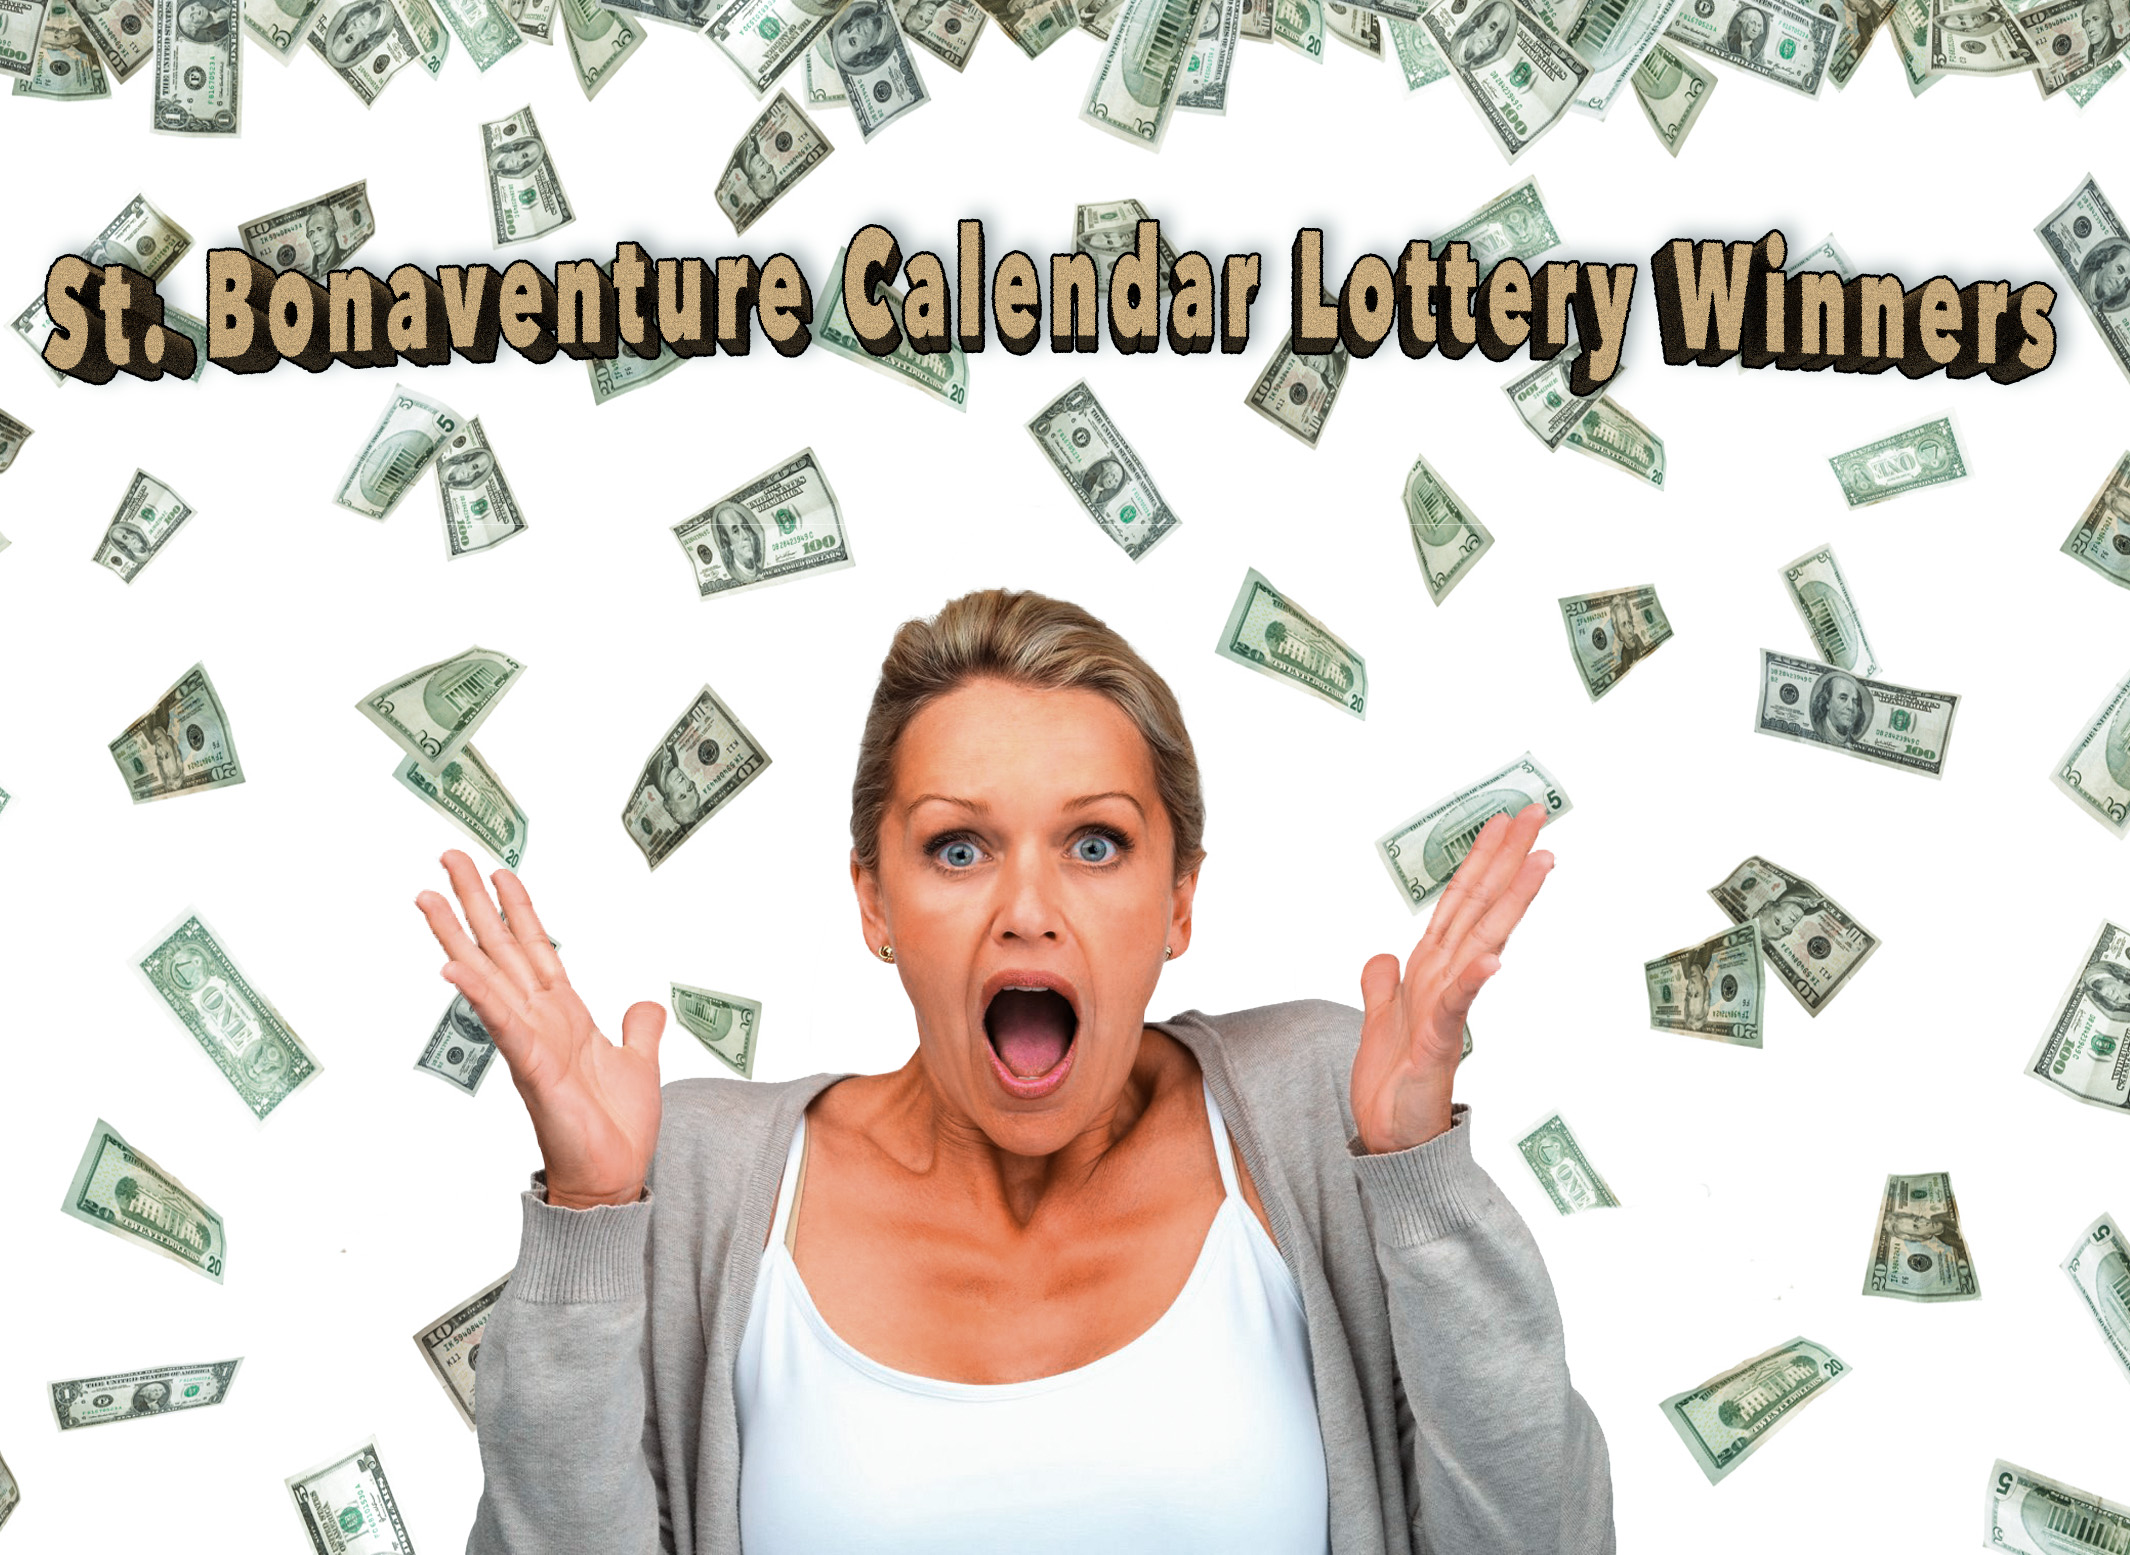 Calendar Lottery Winners - Saint Bonaventure Catholic Church